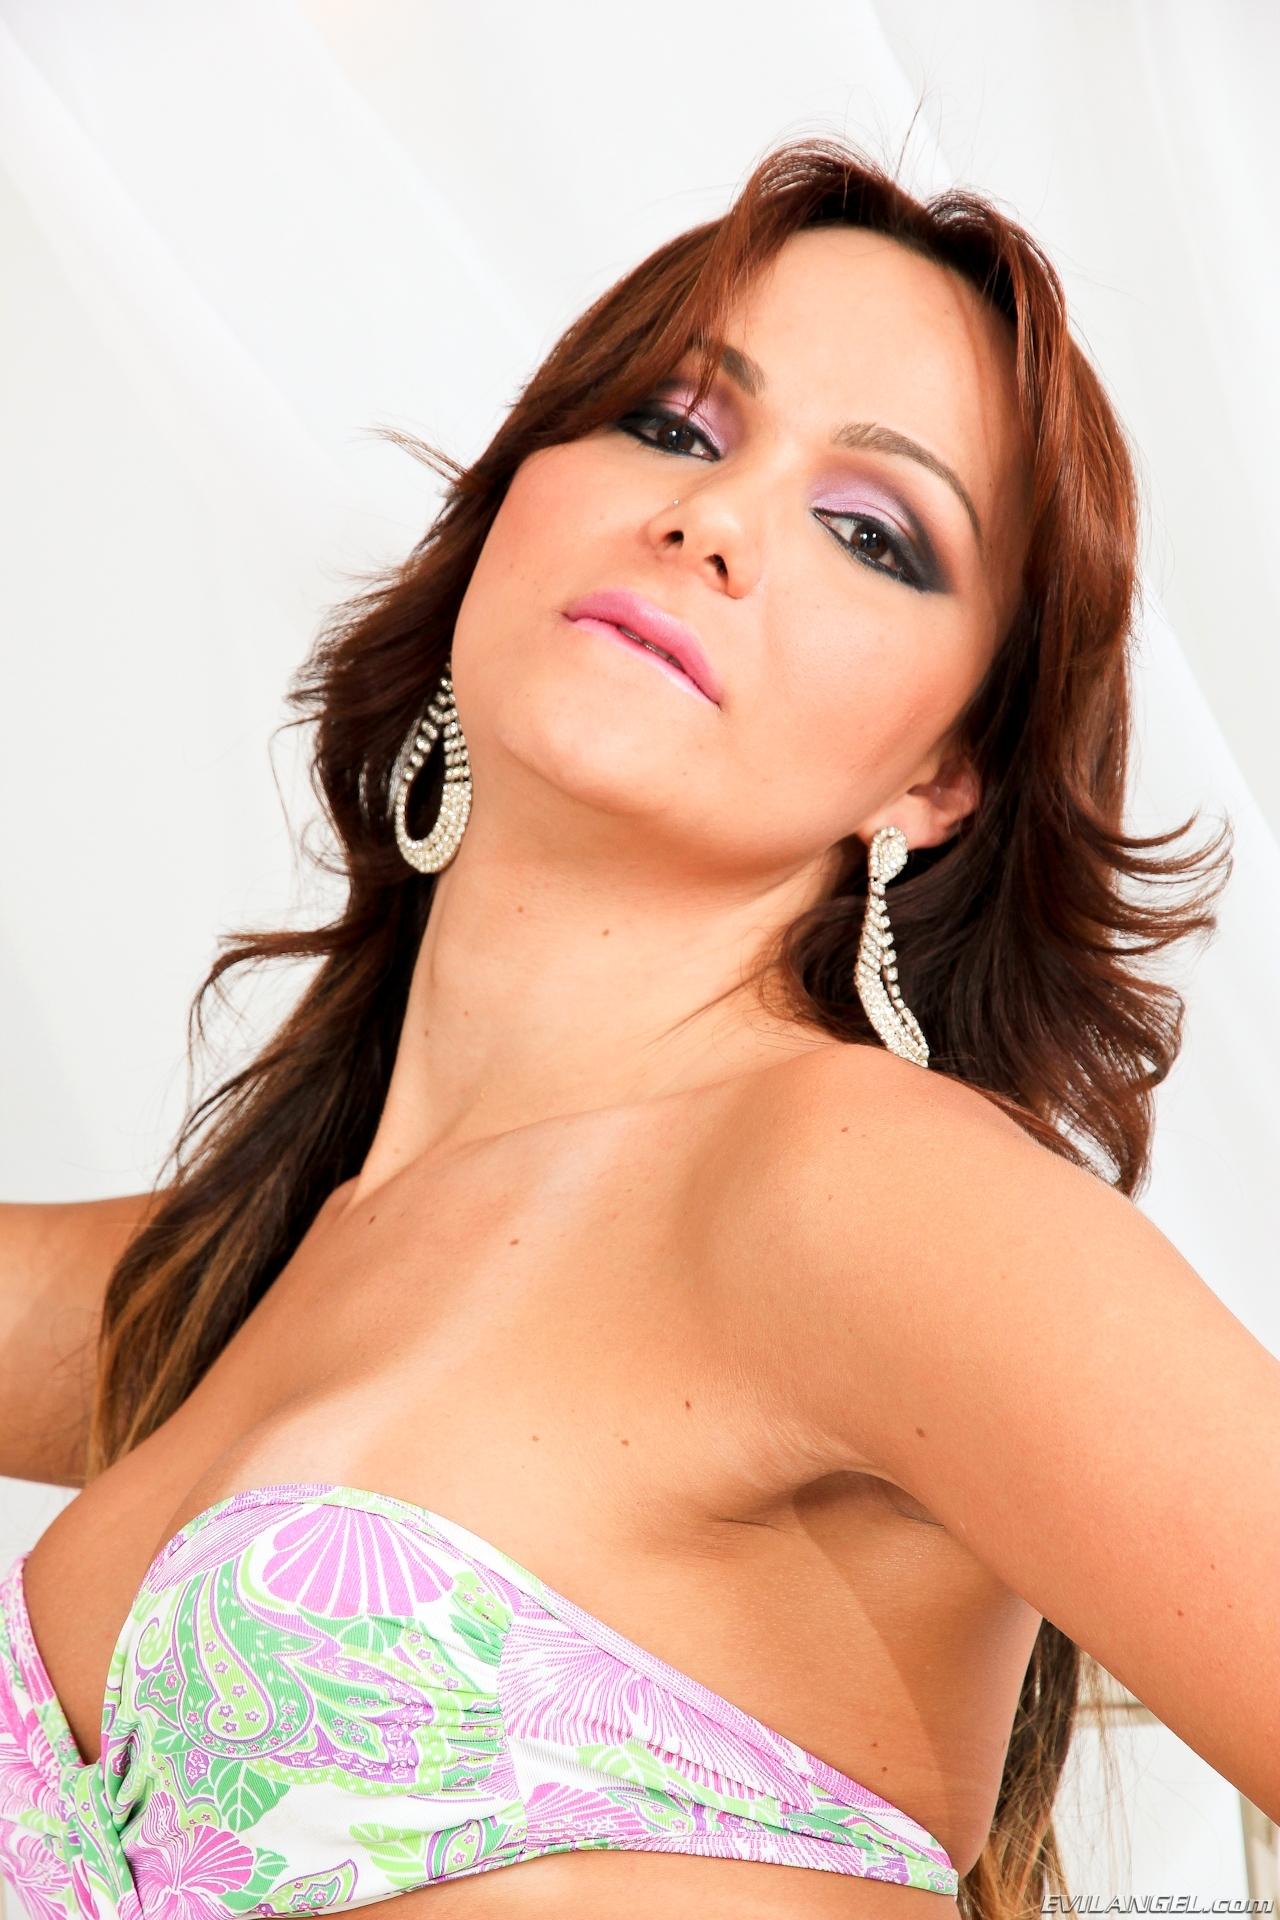 jessica hilton in provocative bikini